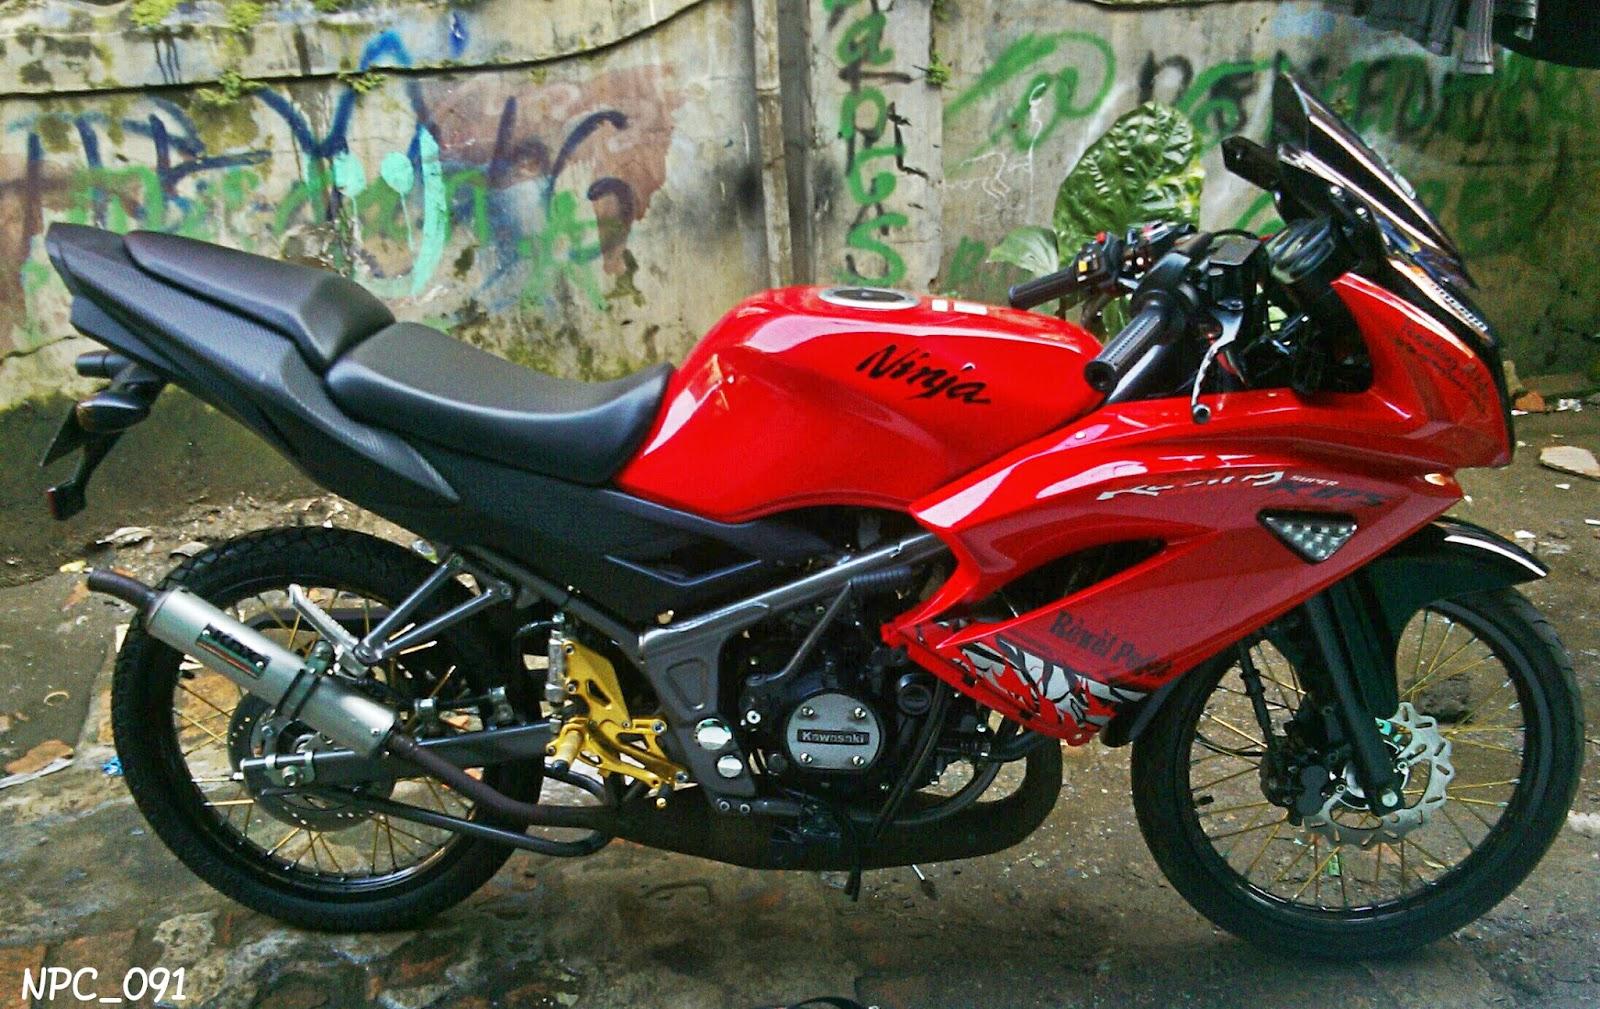 Kawasaki Ninja Rr Modif Jari Jari